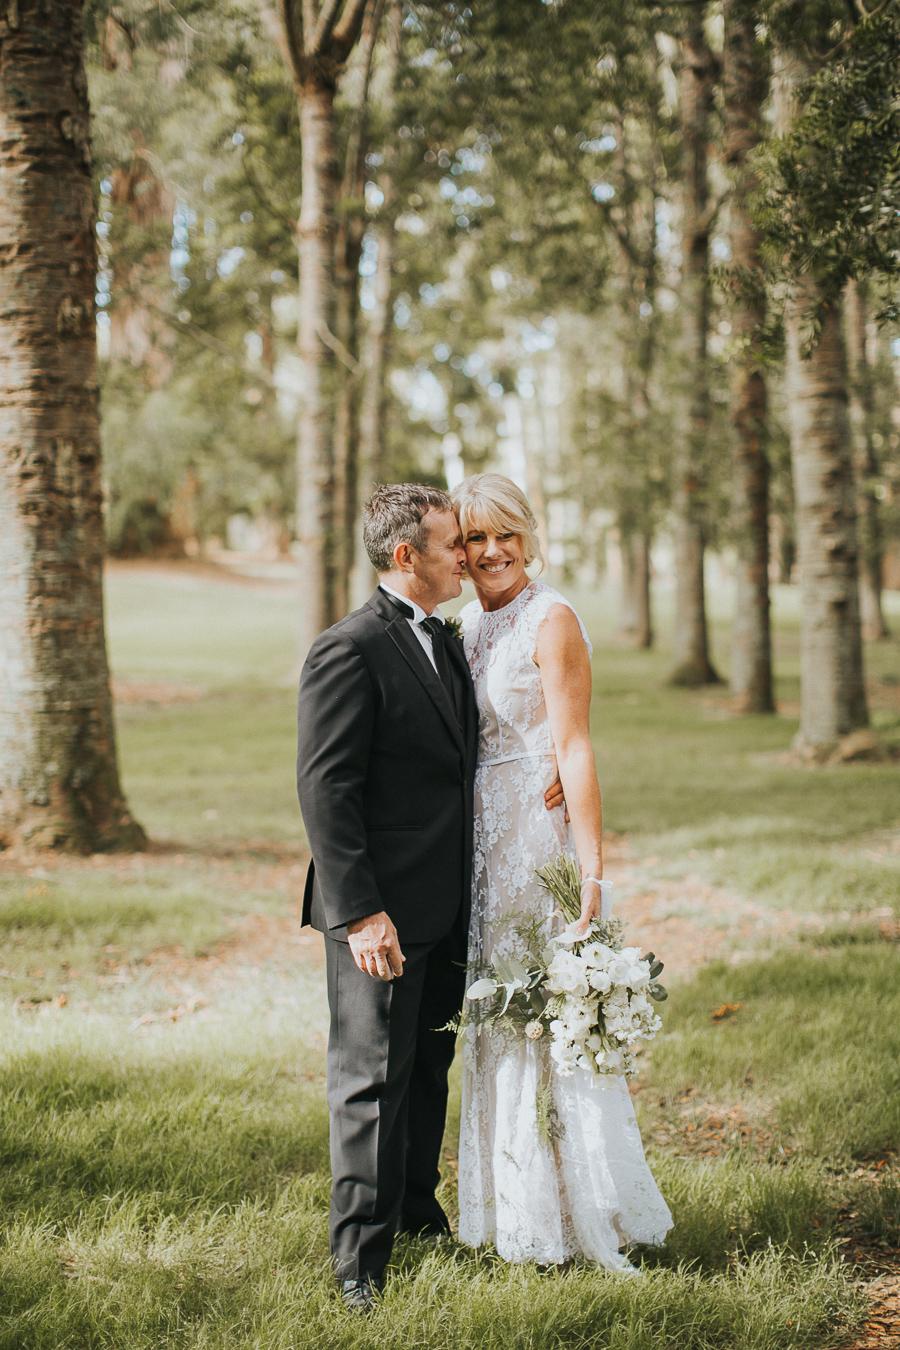 Auckland wedding photographer Victoria Mike109.JPG